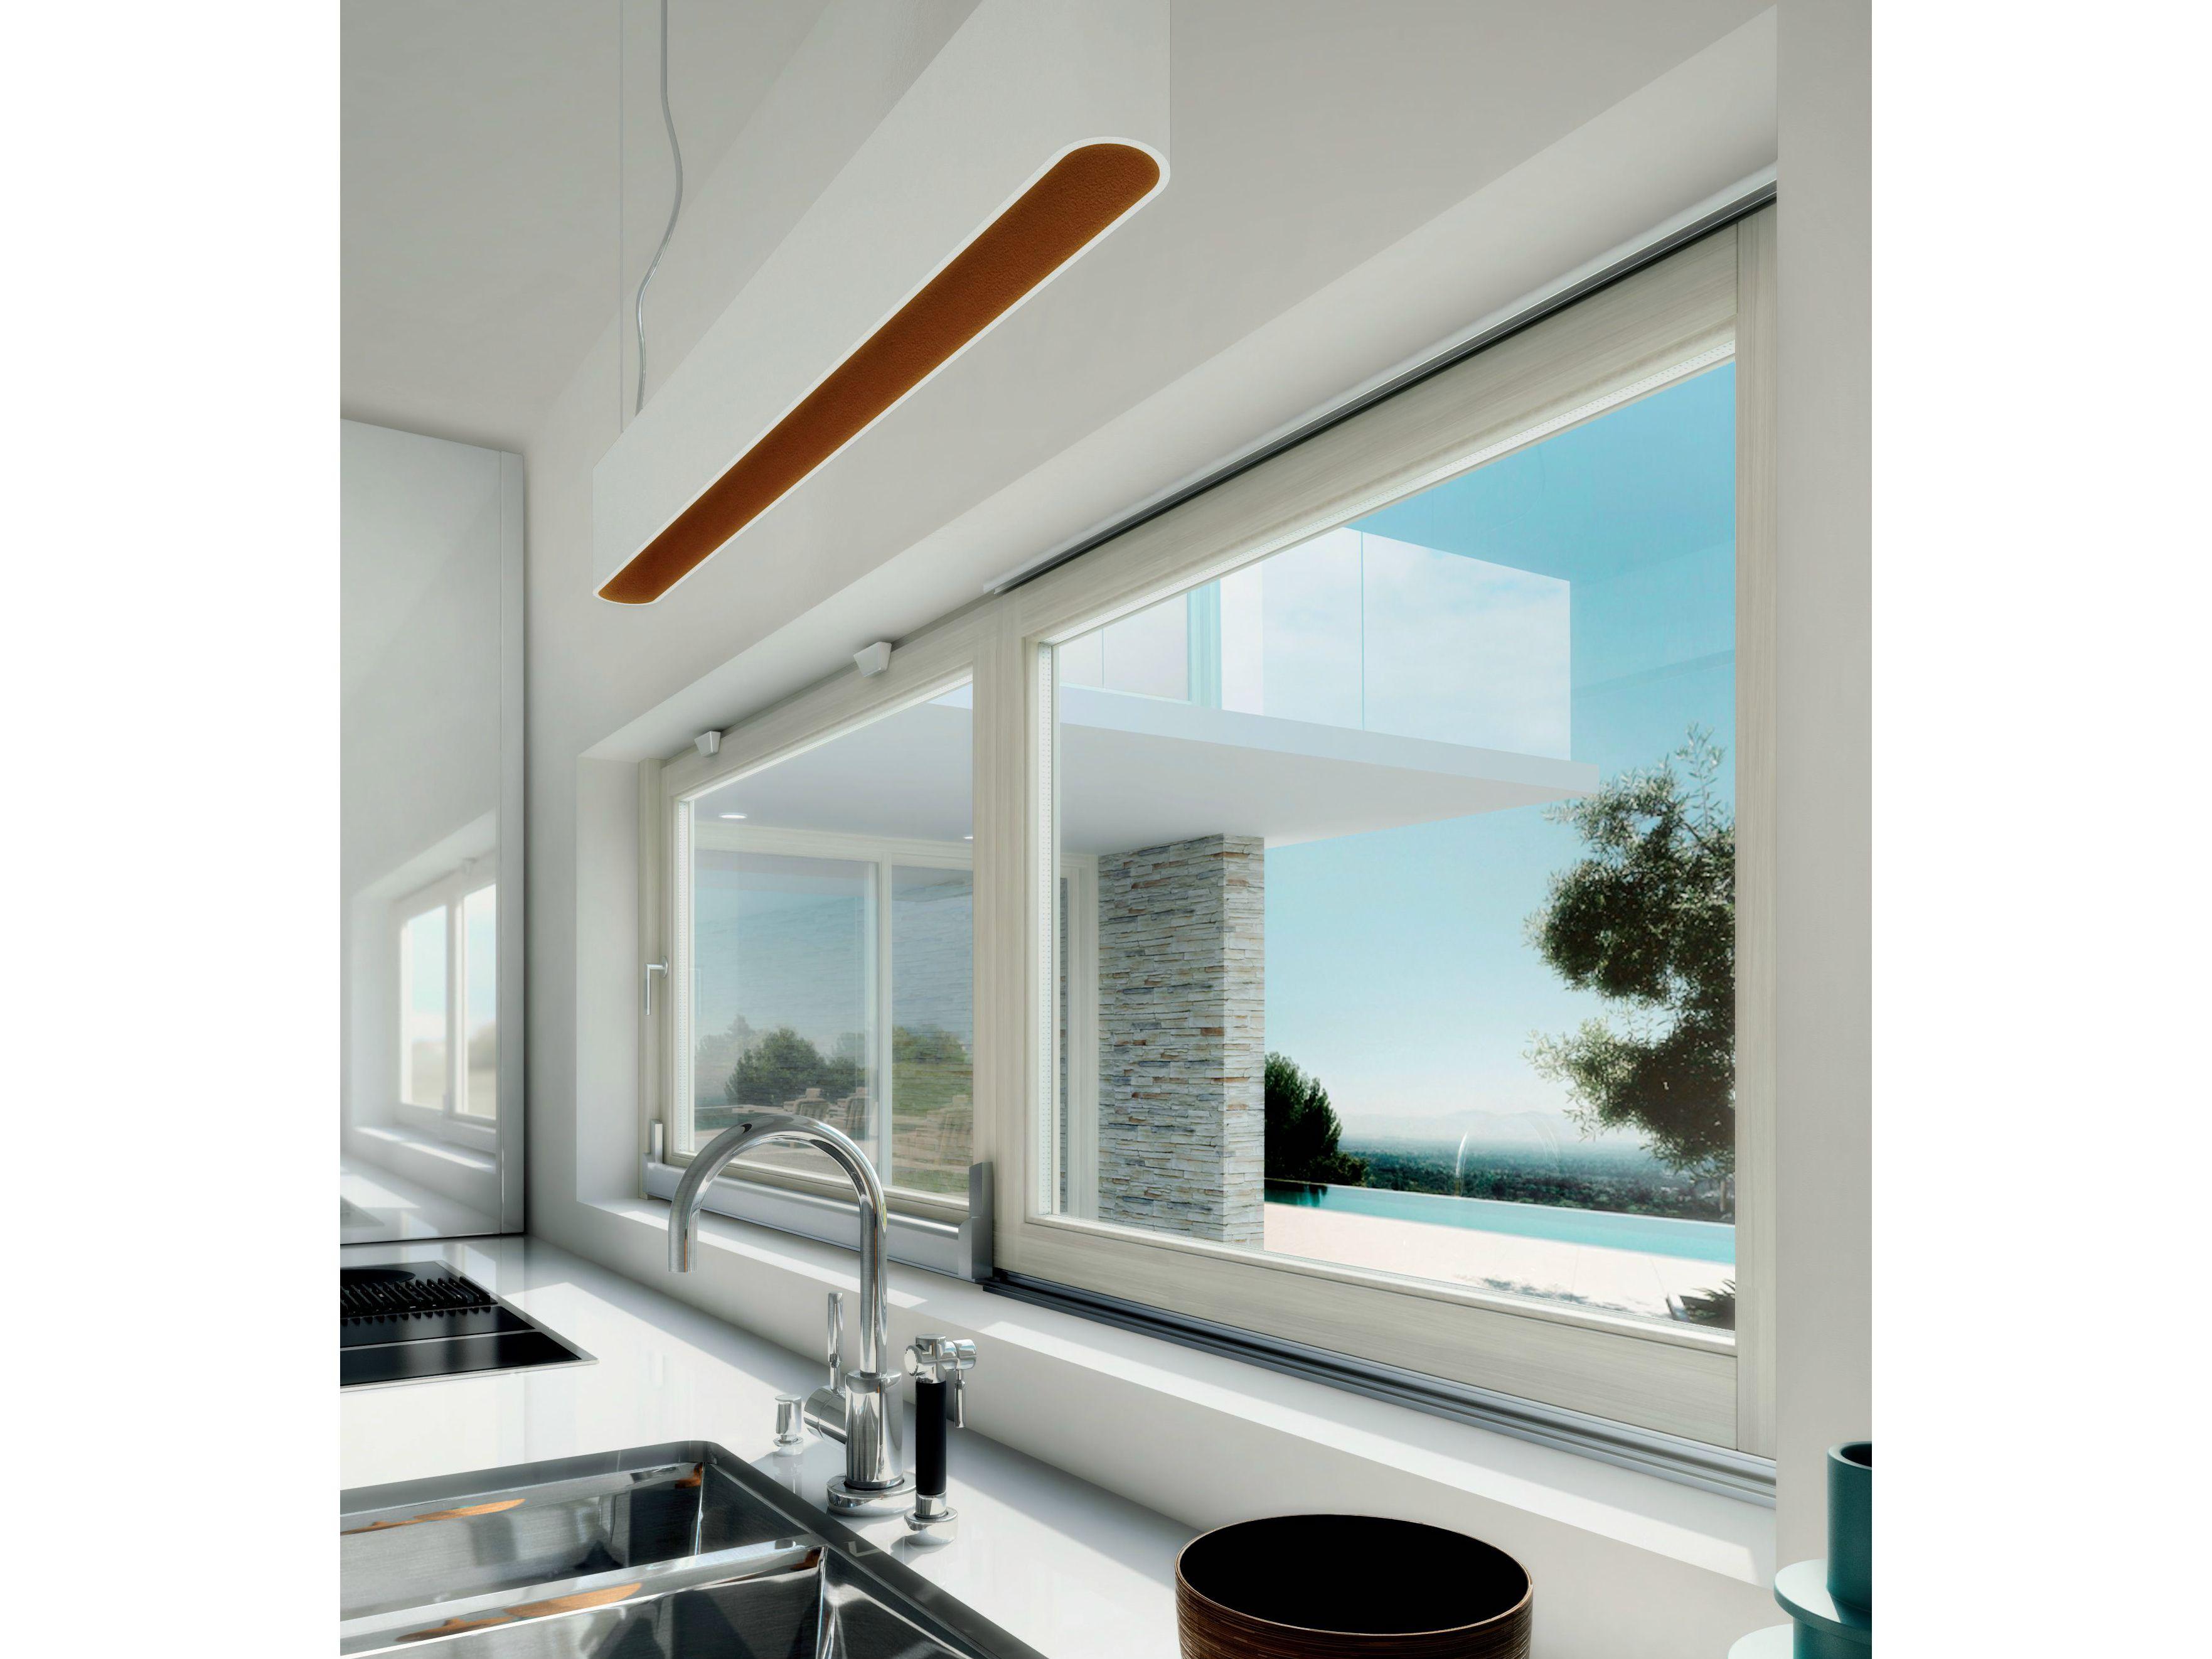 plissee 140 cm breit plissee 130 cm breit planung. Black Bedroom Furniture Sets. Home Design Ideas